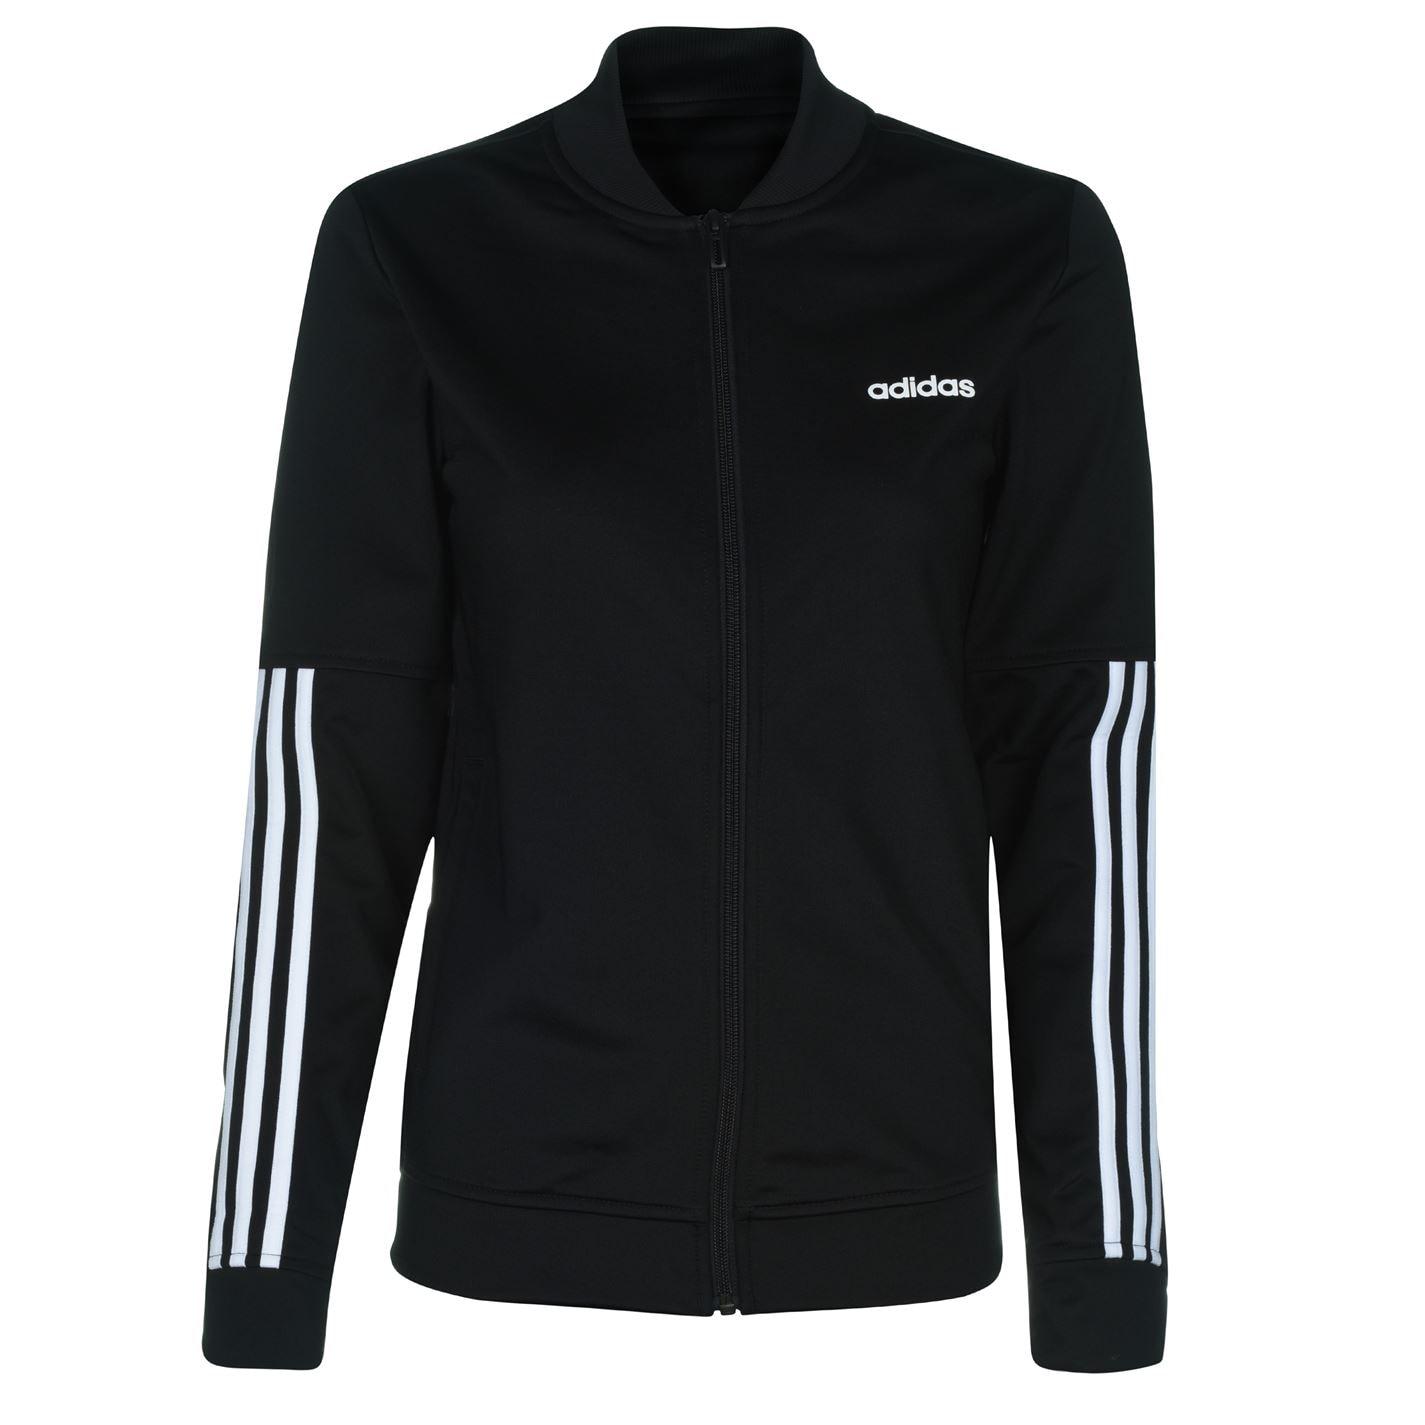 Mergi la Bluza trening neagra adidas Back 2 Basics 3-Stripes femei